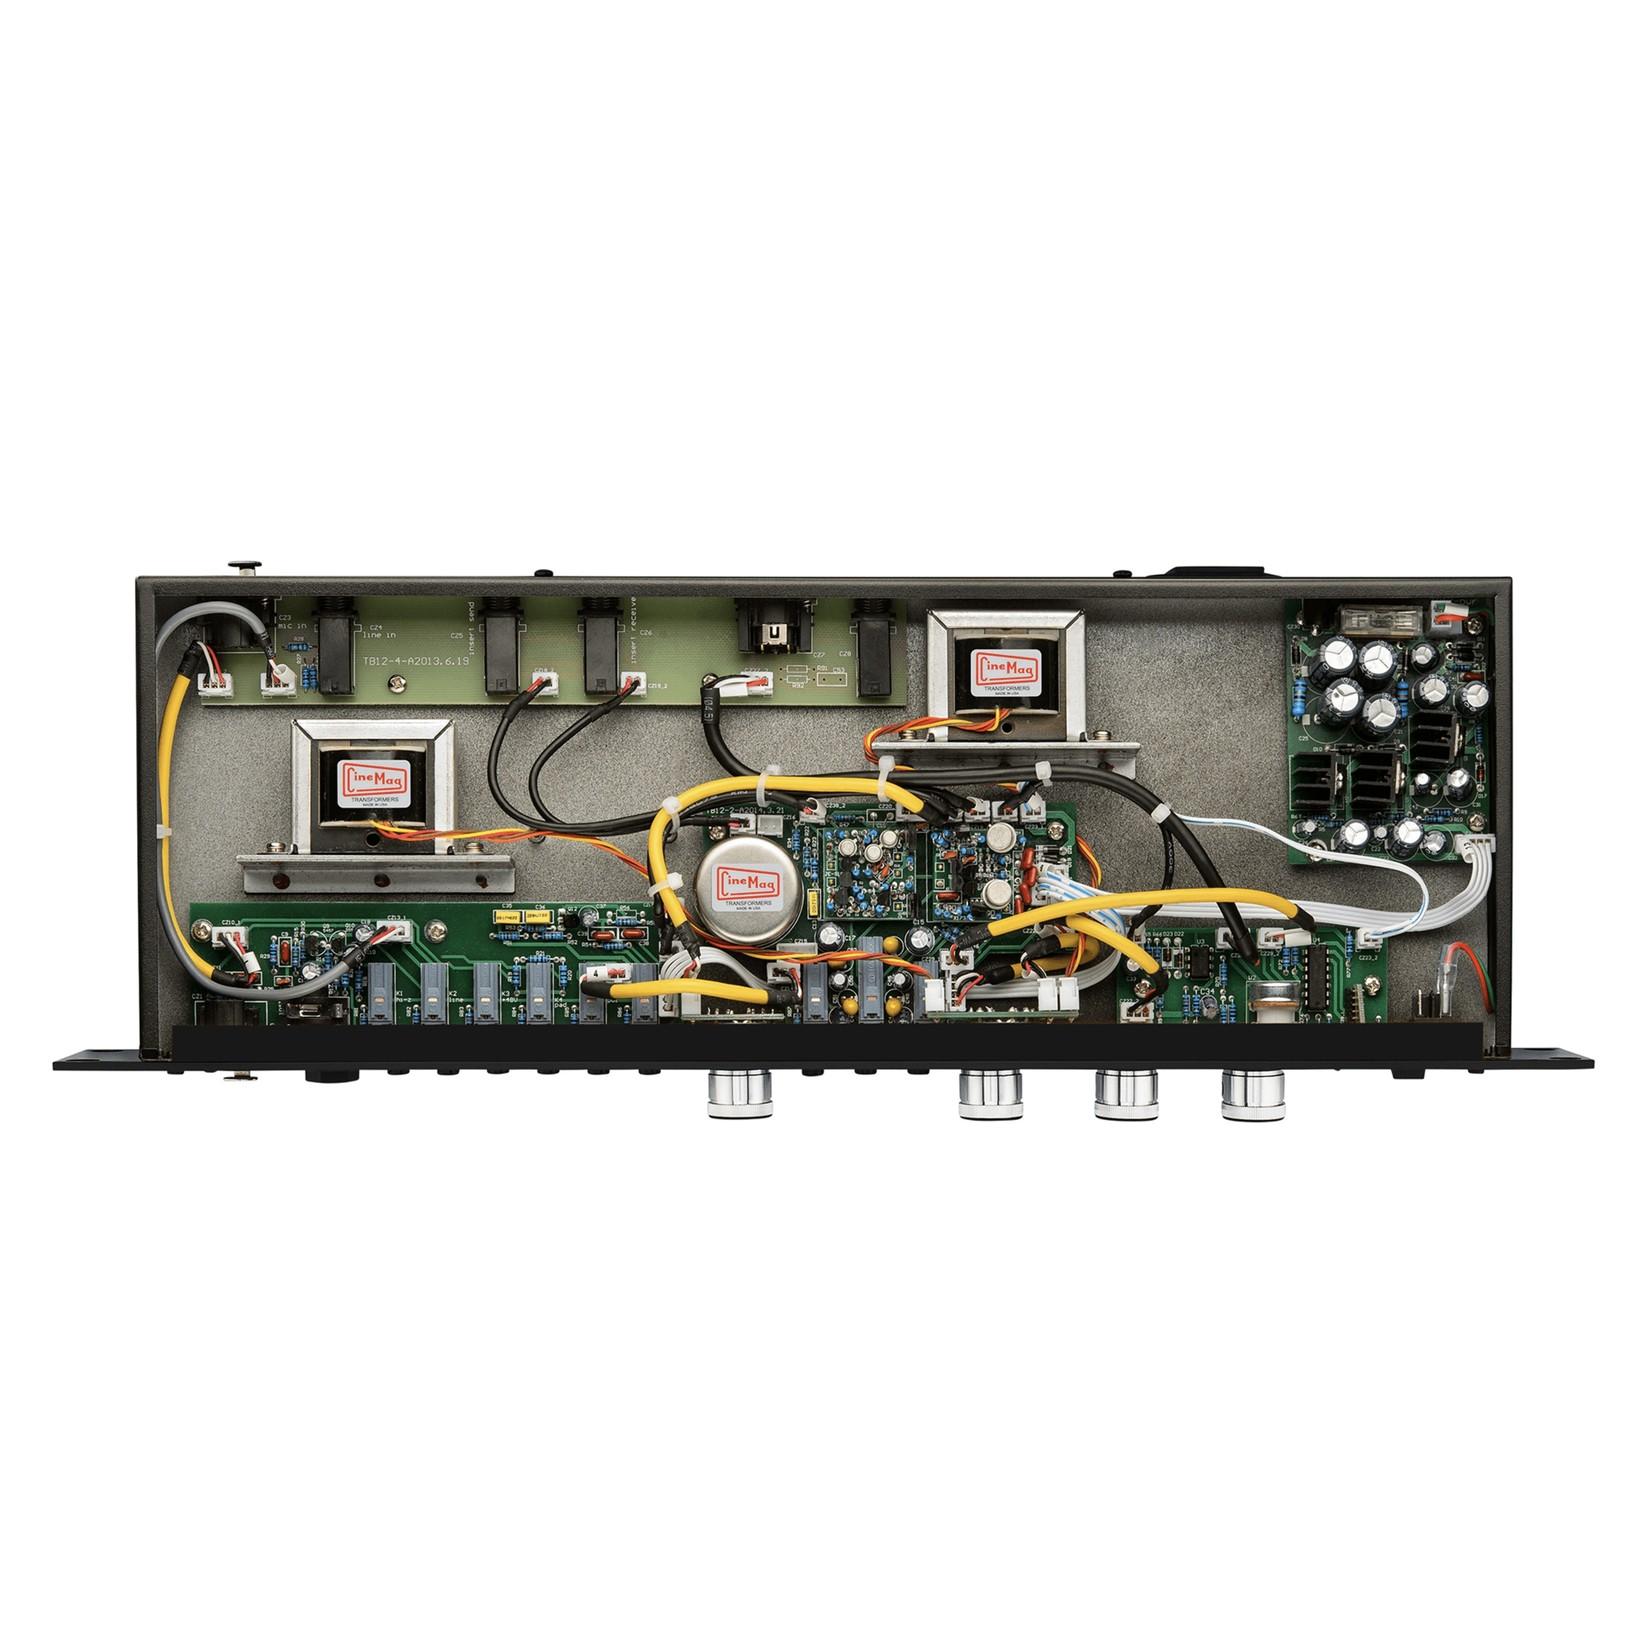 "Warm Audio Warm Audio TB12 Black ""Tone Beast"" Tone Shaping Mic Preamp"